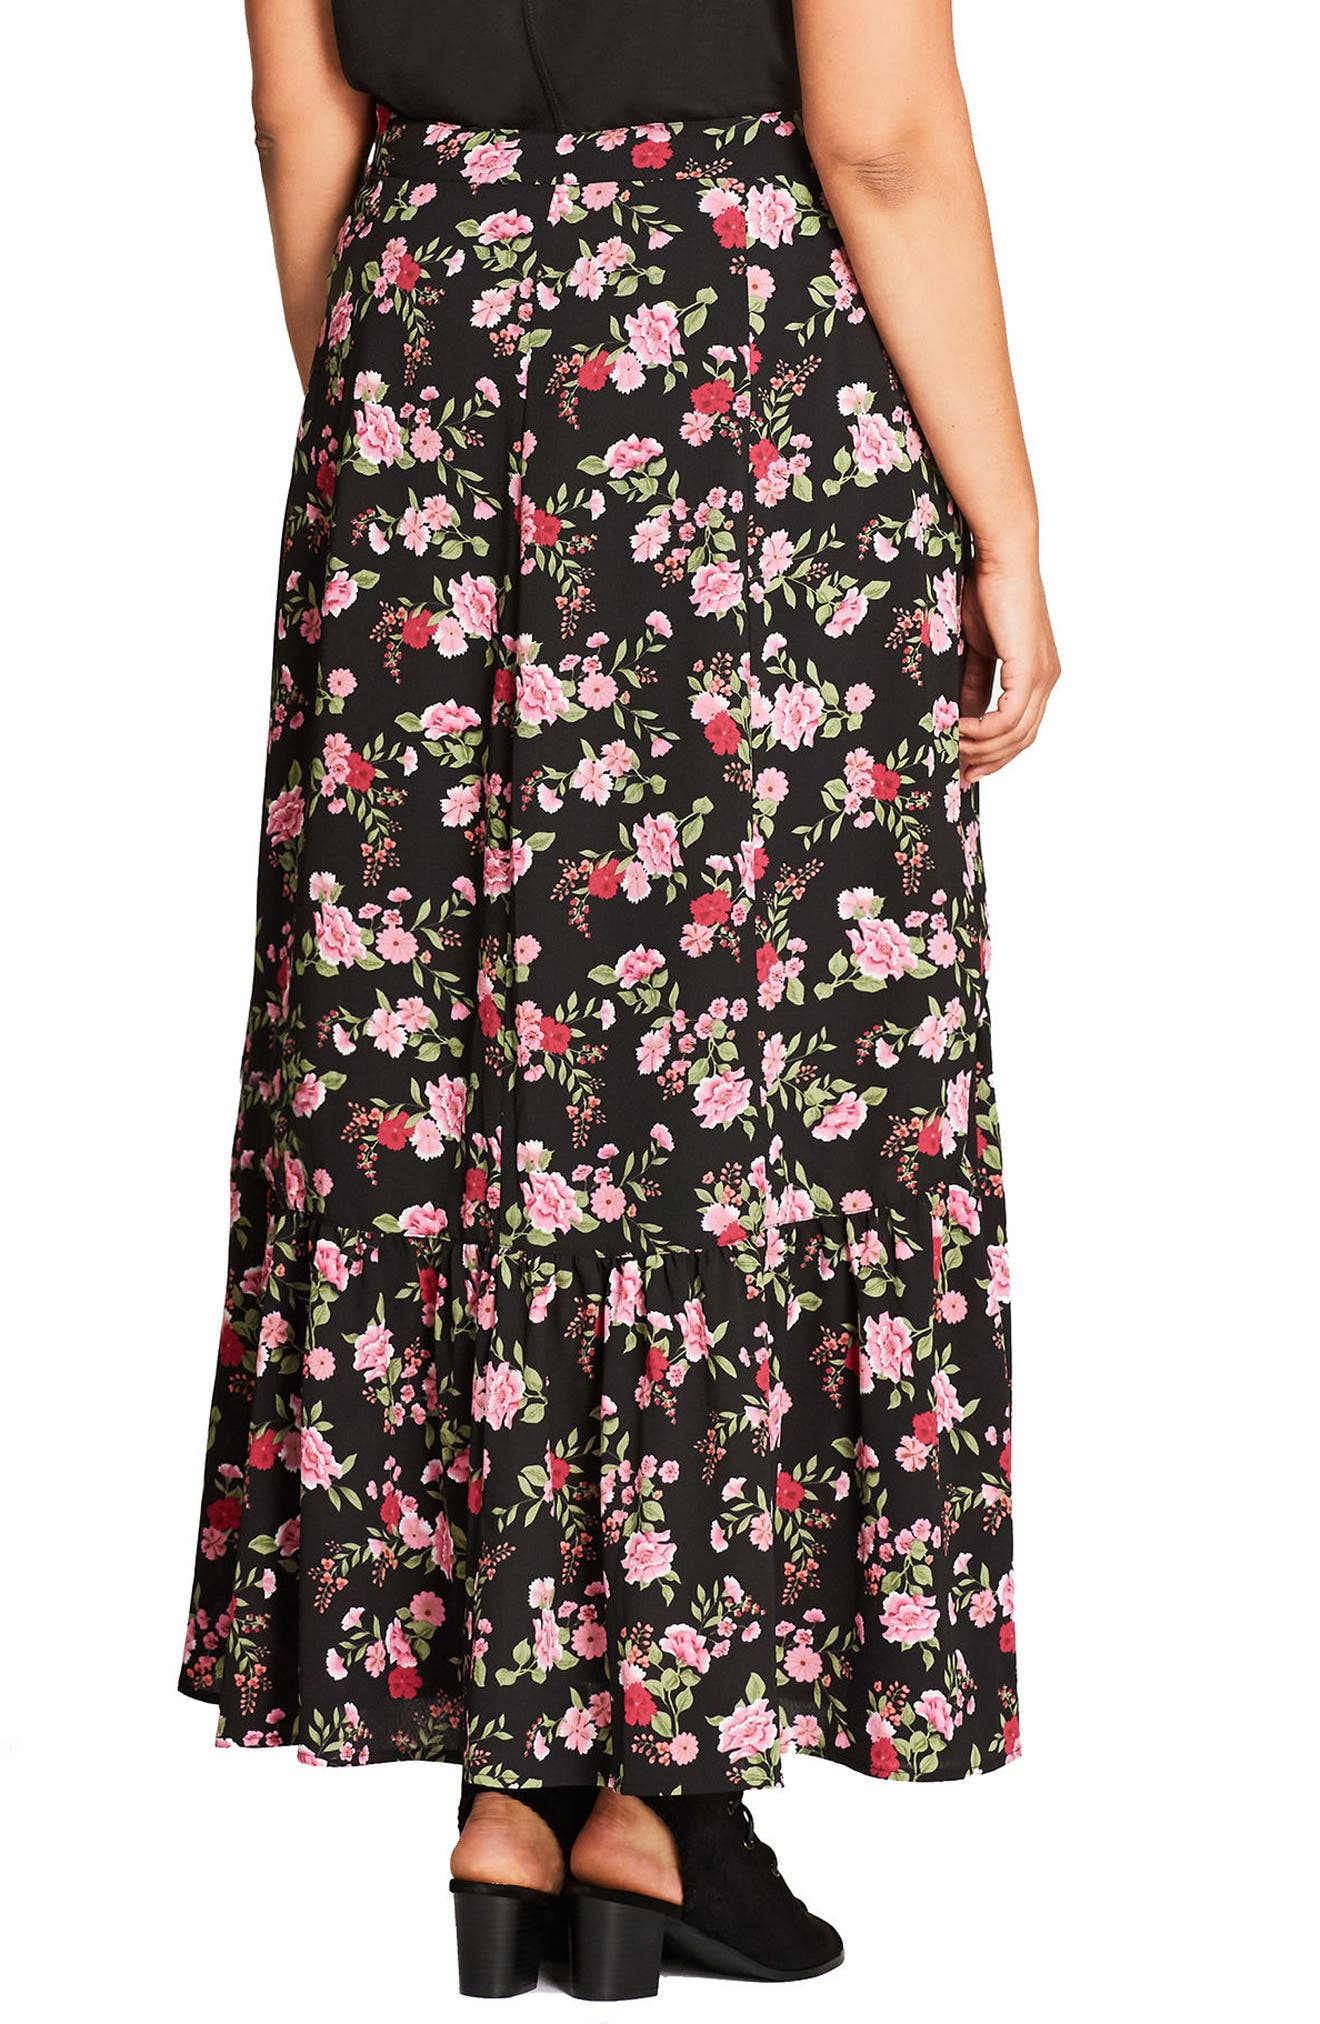 Free Spirit Maxi Skirt,                             Alternate thumbnail 2, color,                             602